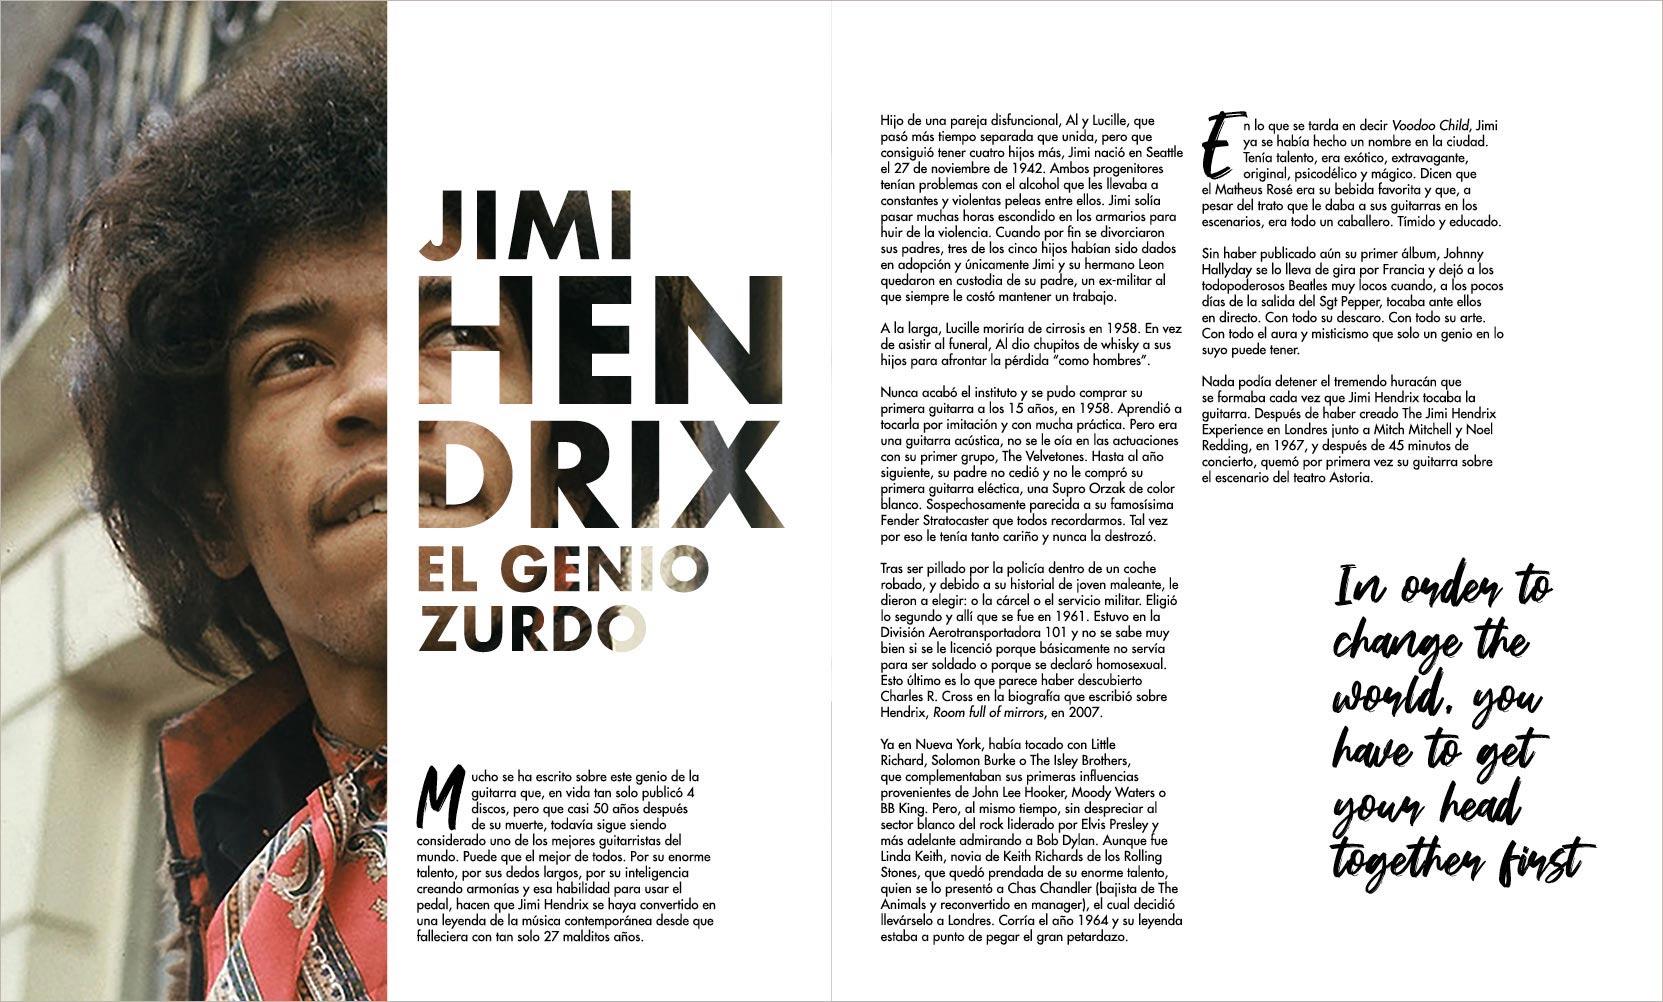 Jimi Hendrix: genio zurdo